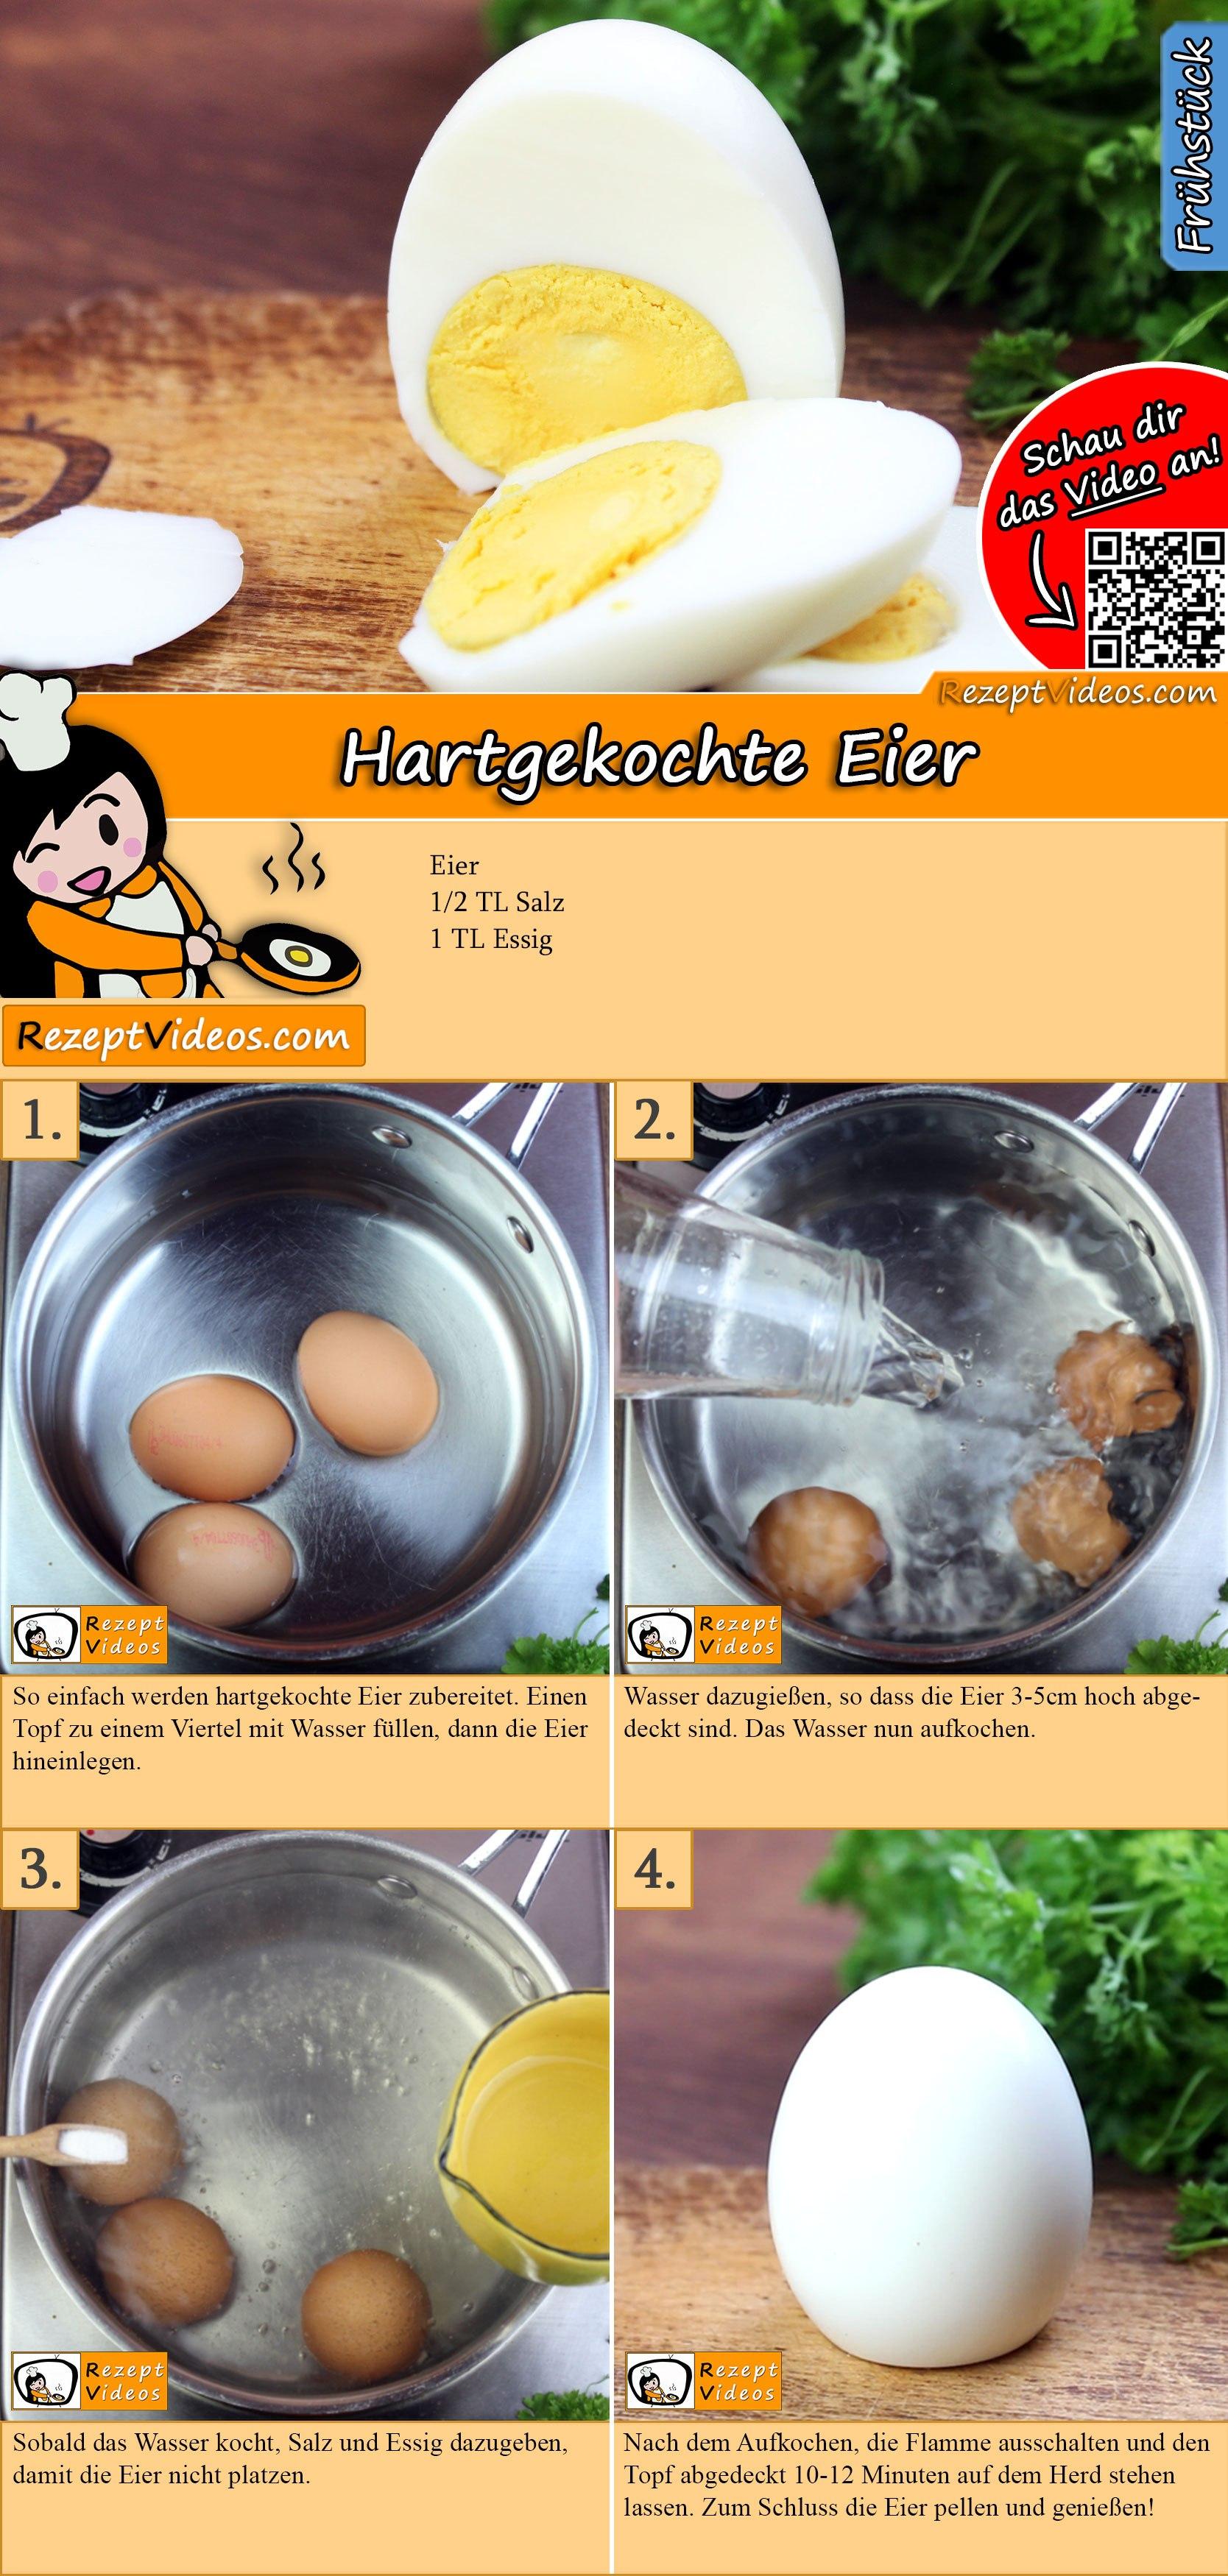 Hartgekochte Eier Rezept mit Video